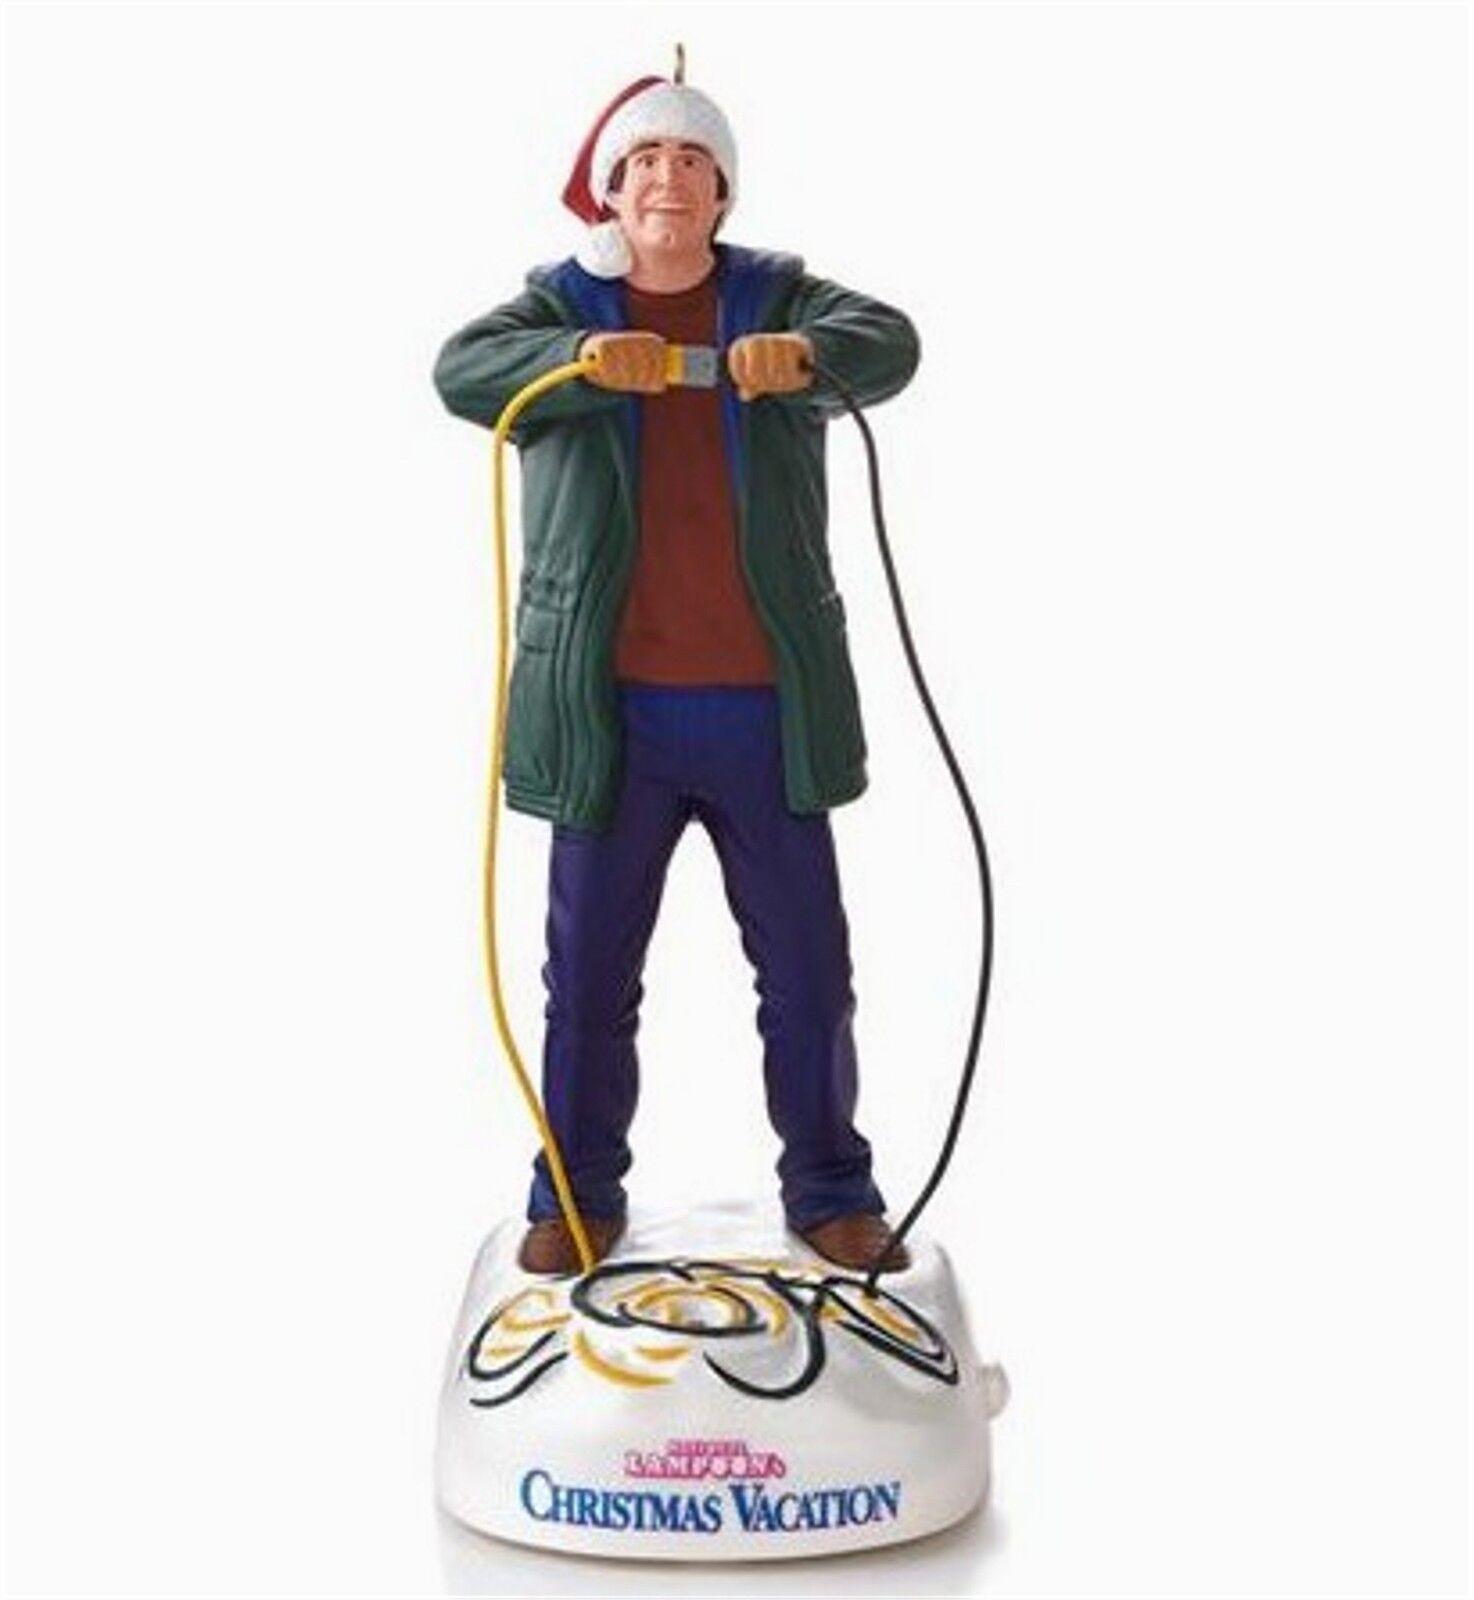 Hallmark 2013 Clark's Christmas Miracle National Lampoons Vacation Ornament